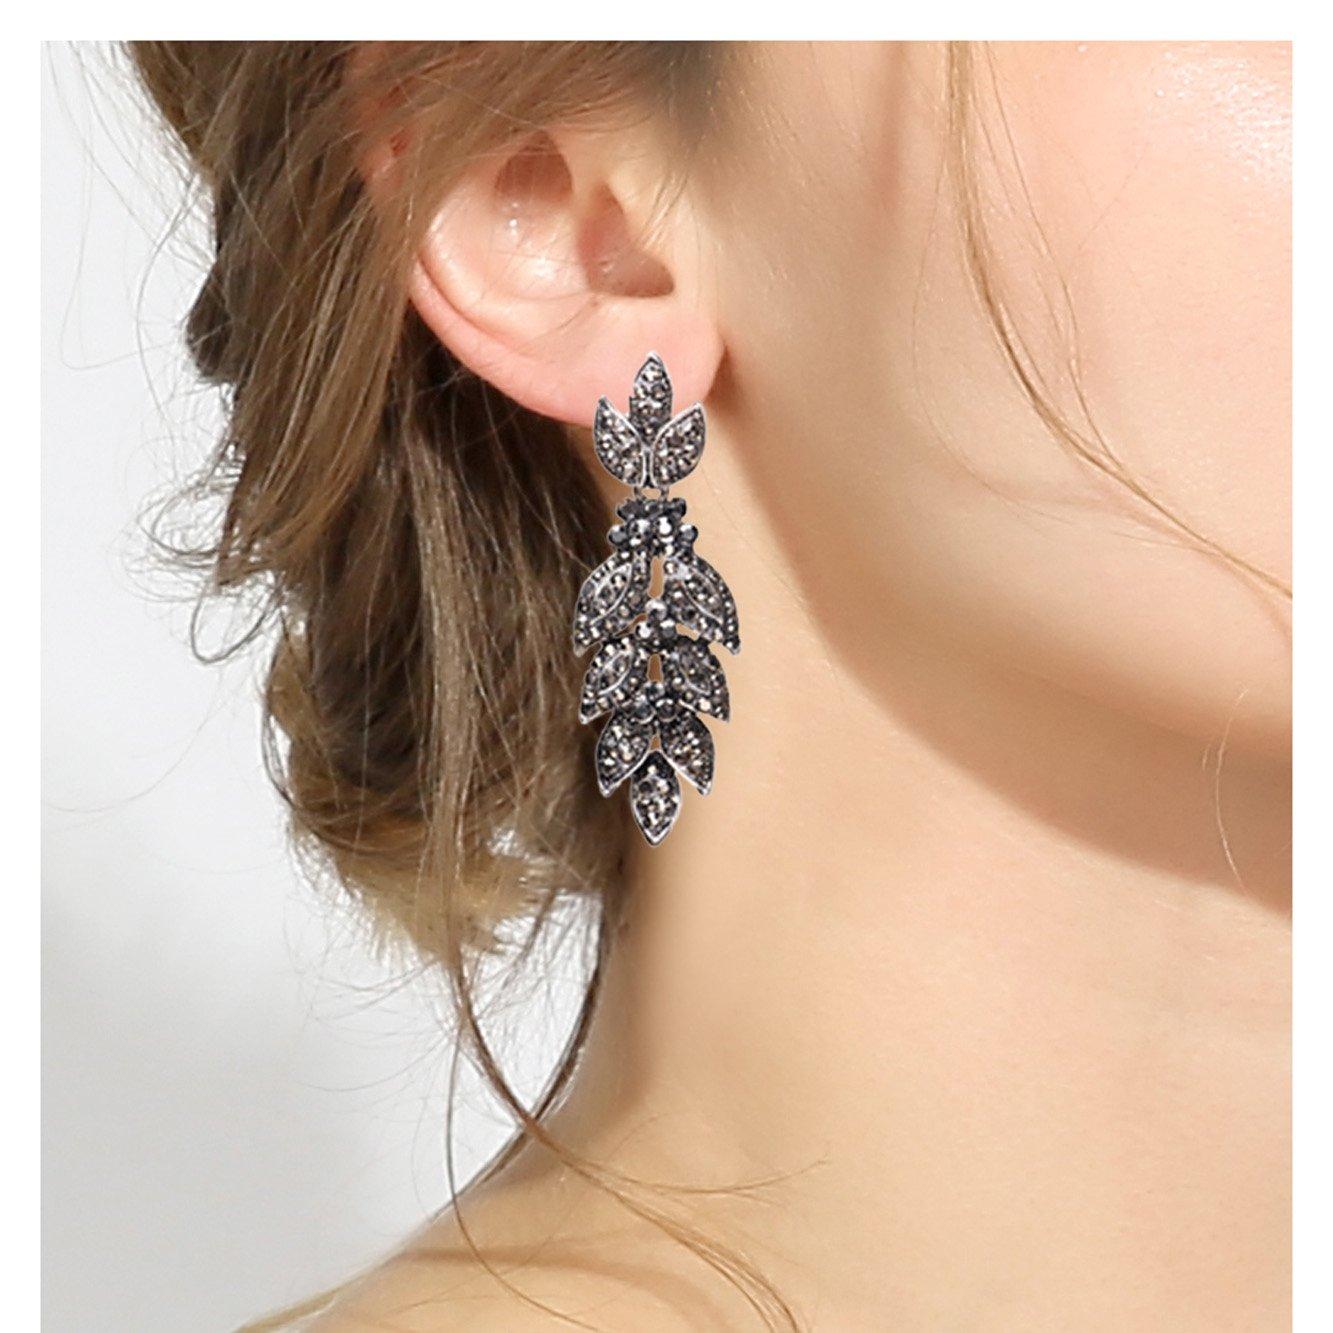 Unicra Vintage Black Crystal Stud Earrings Wedding Bridal Multiple Rhinestone Earrings Chandelier Long Dangle Earrings for Women and Girls by Unicra (Image #2)